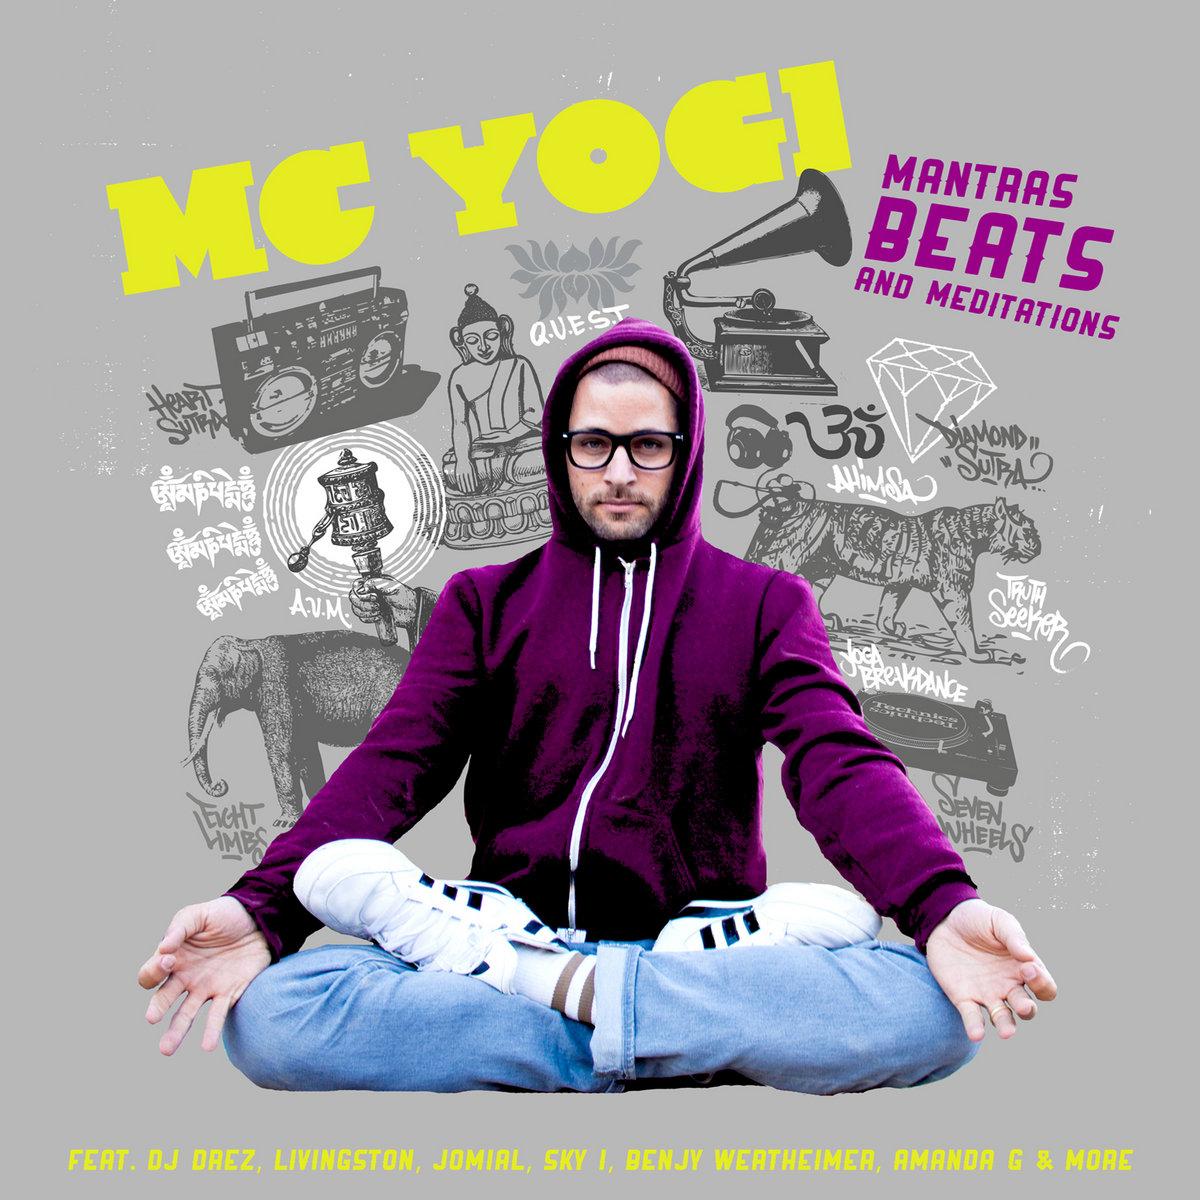 Mantras, Beats & Meditations   White Swan Records